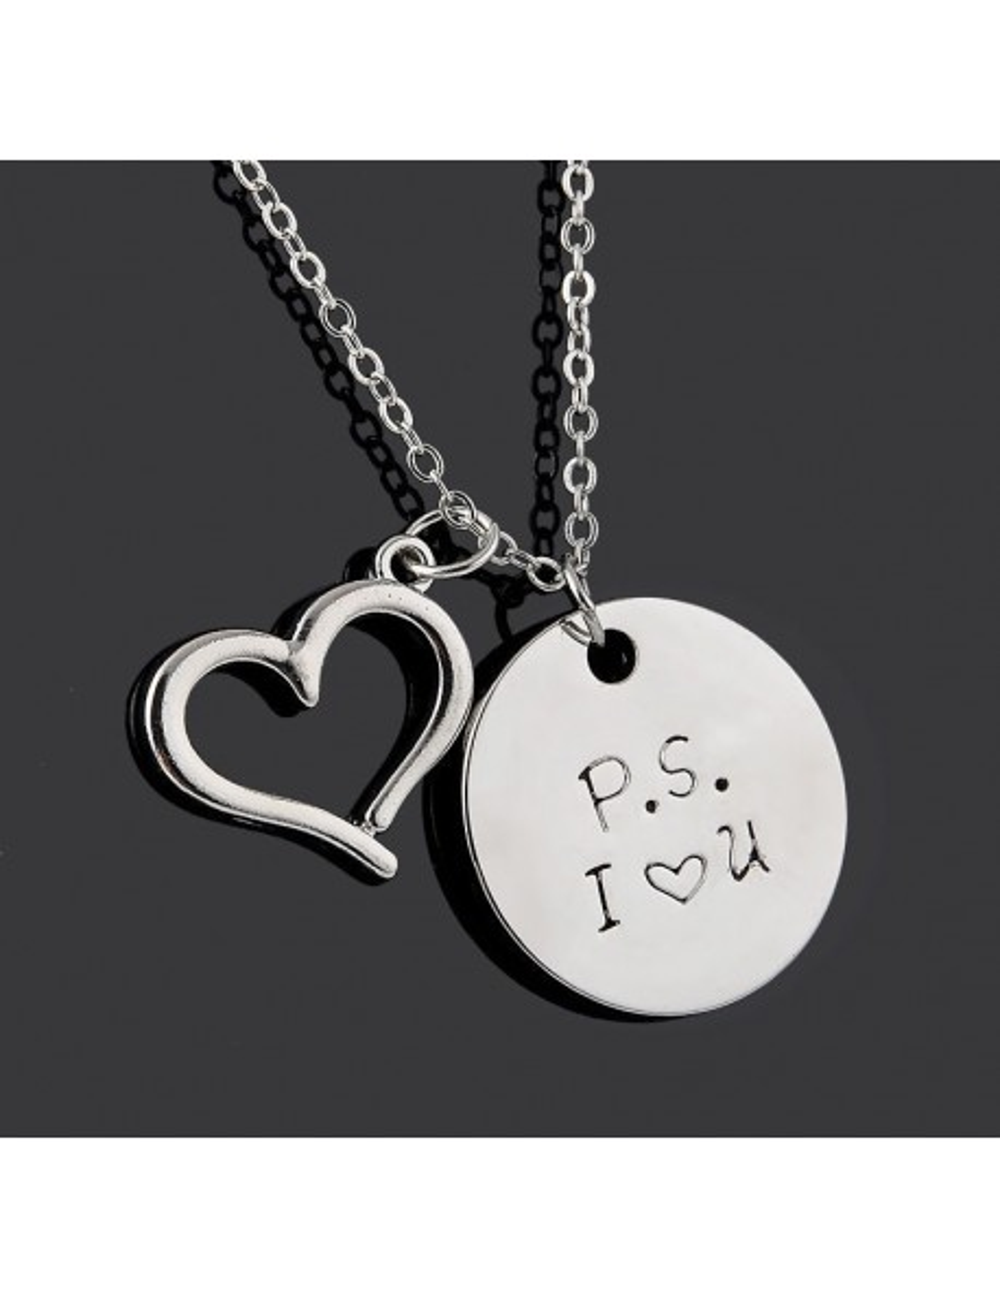 Collar P.S I Love You